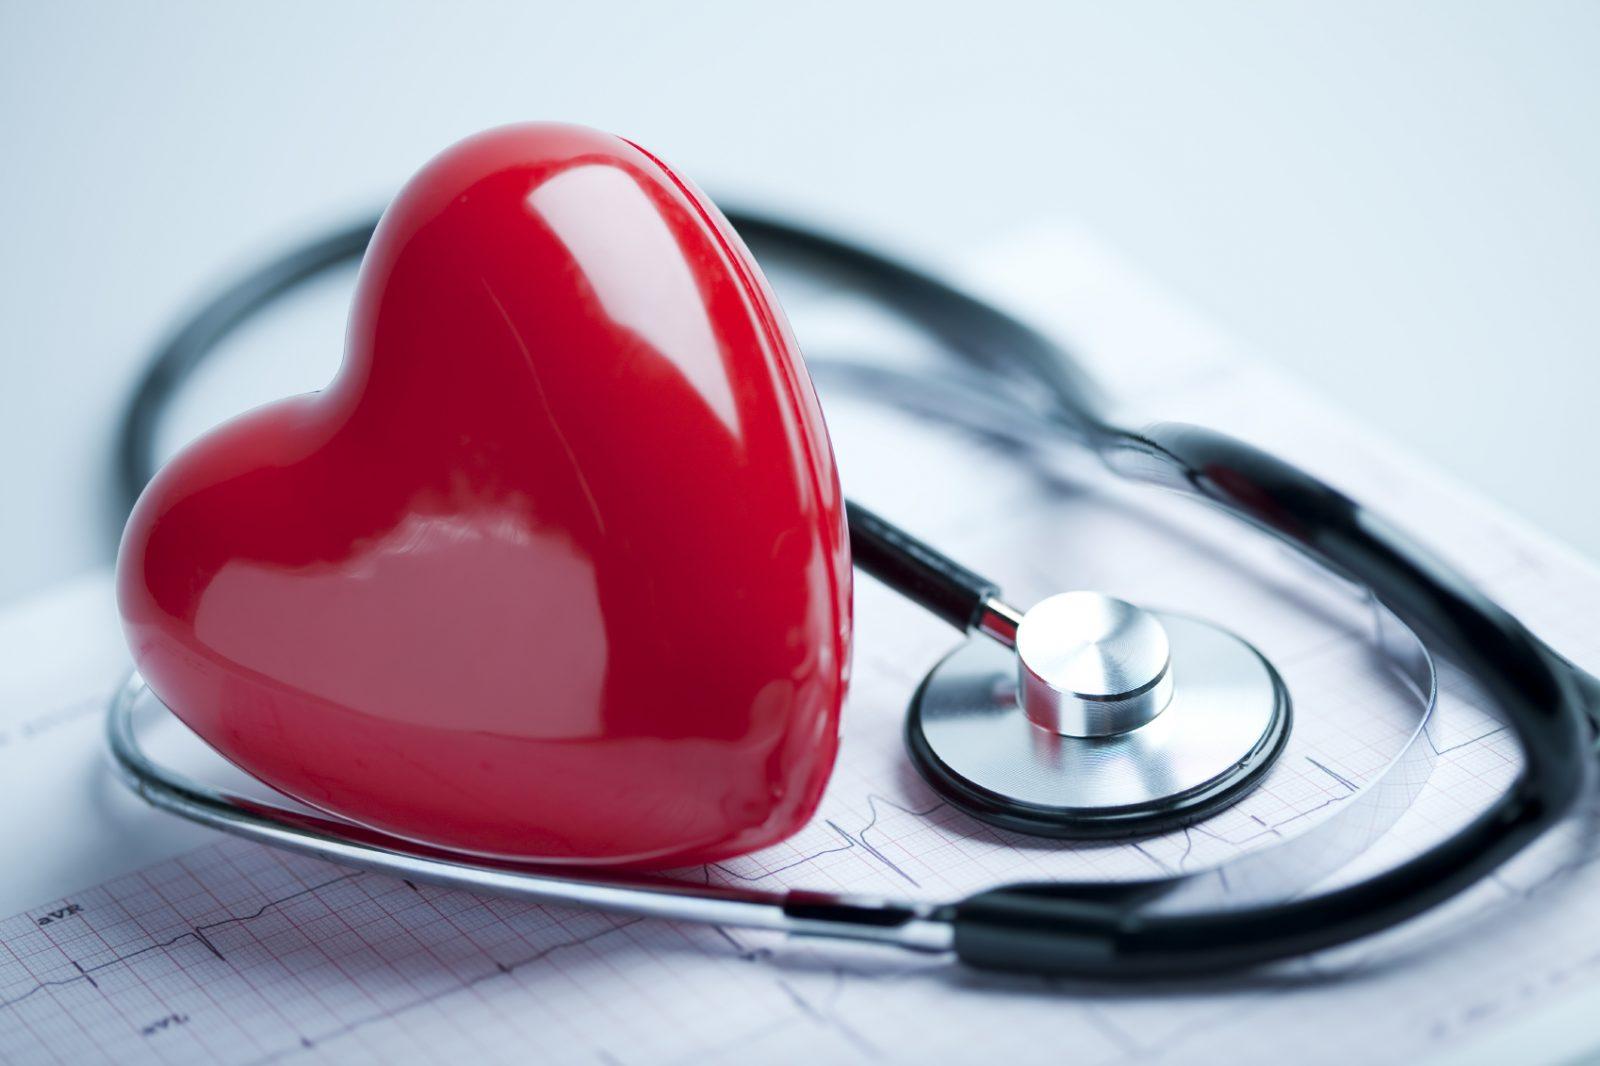 alimentosquediminuemocolesteroleprotegemocoração